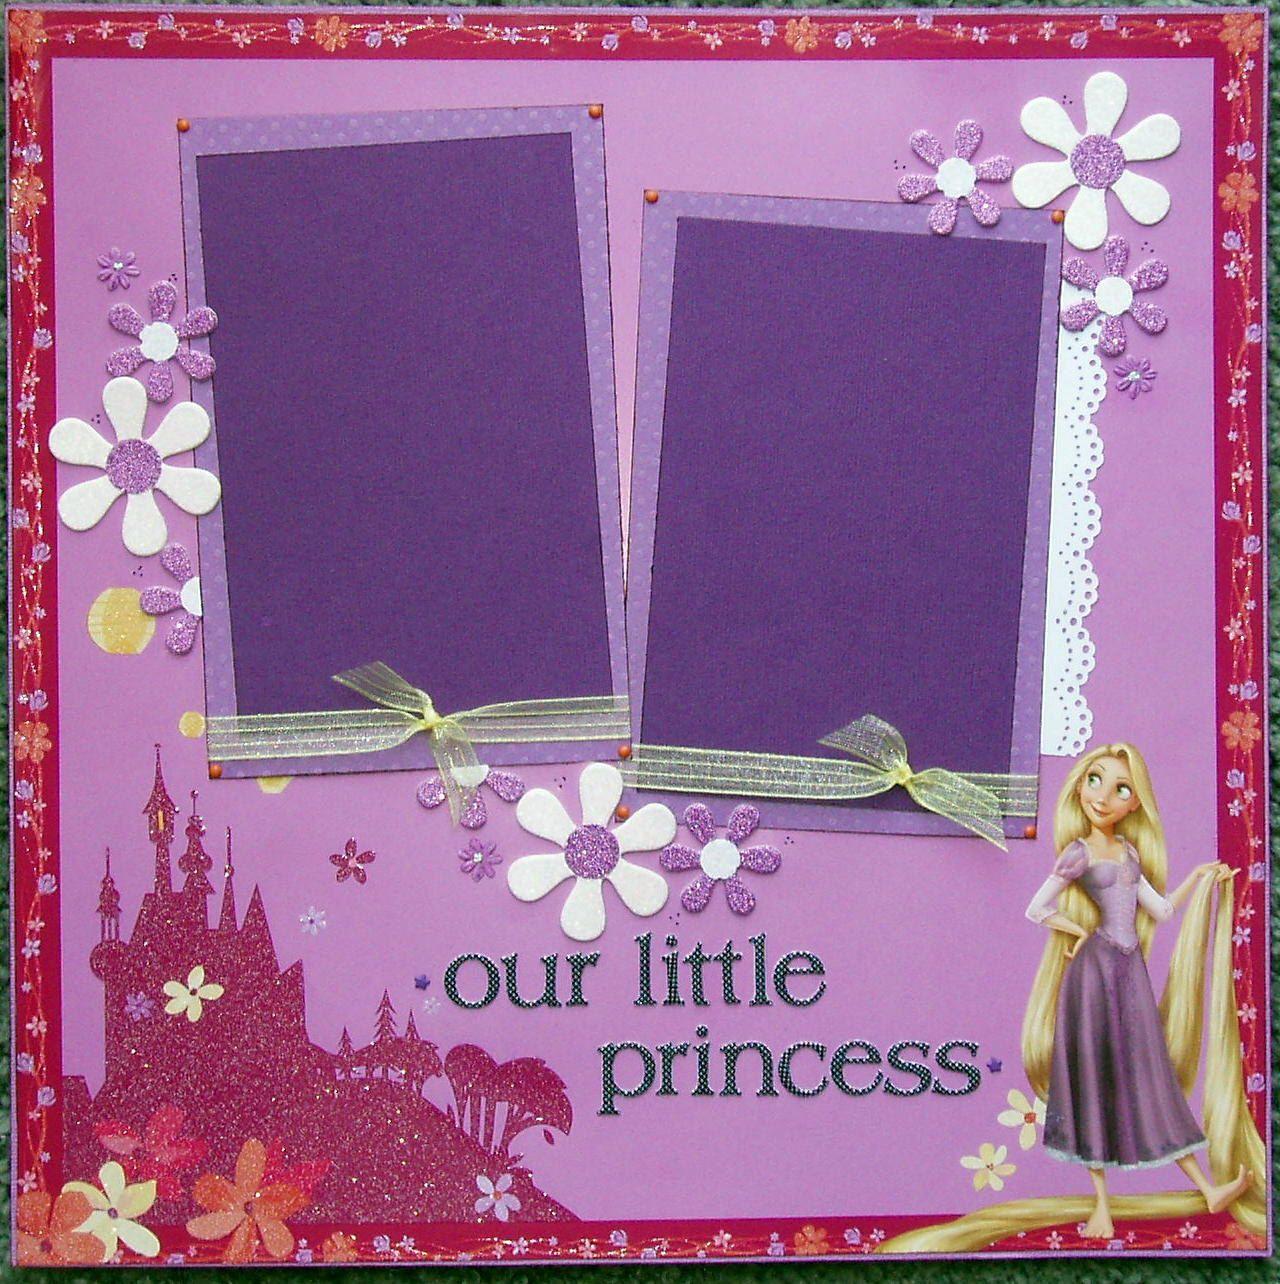 Disney scrapbook ideas - 12x12 Premade Scrapbook Layout Featuring Disney S Rapunzel